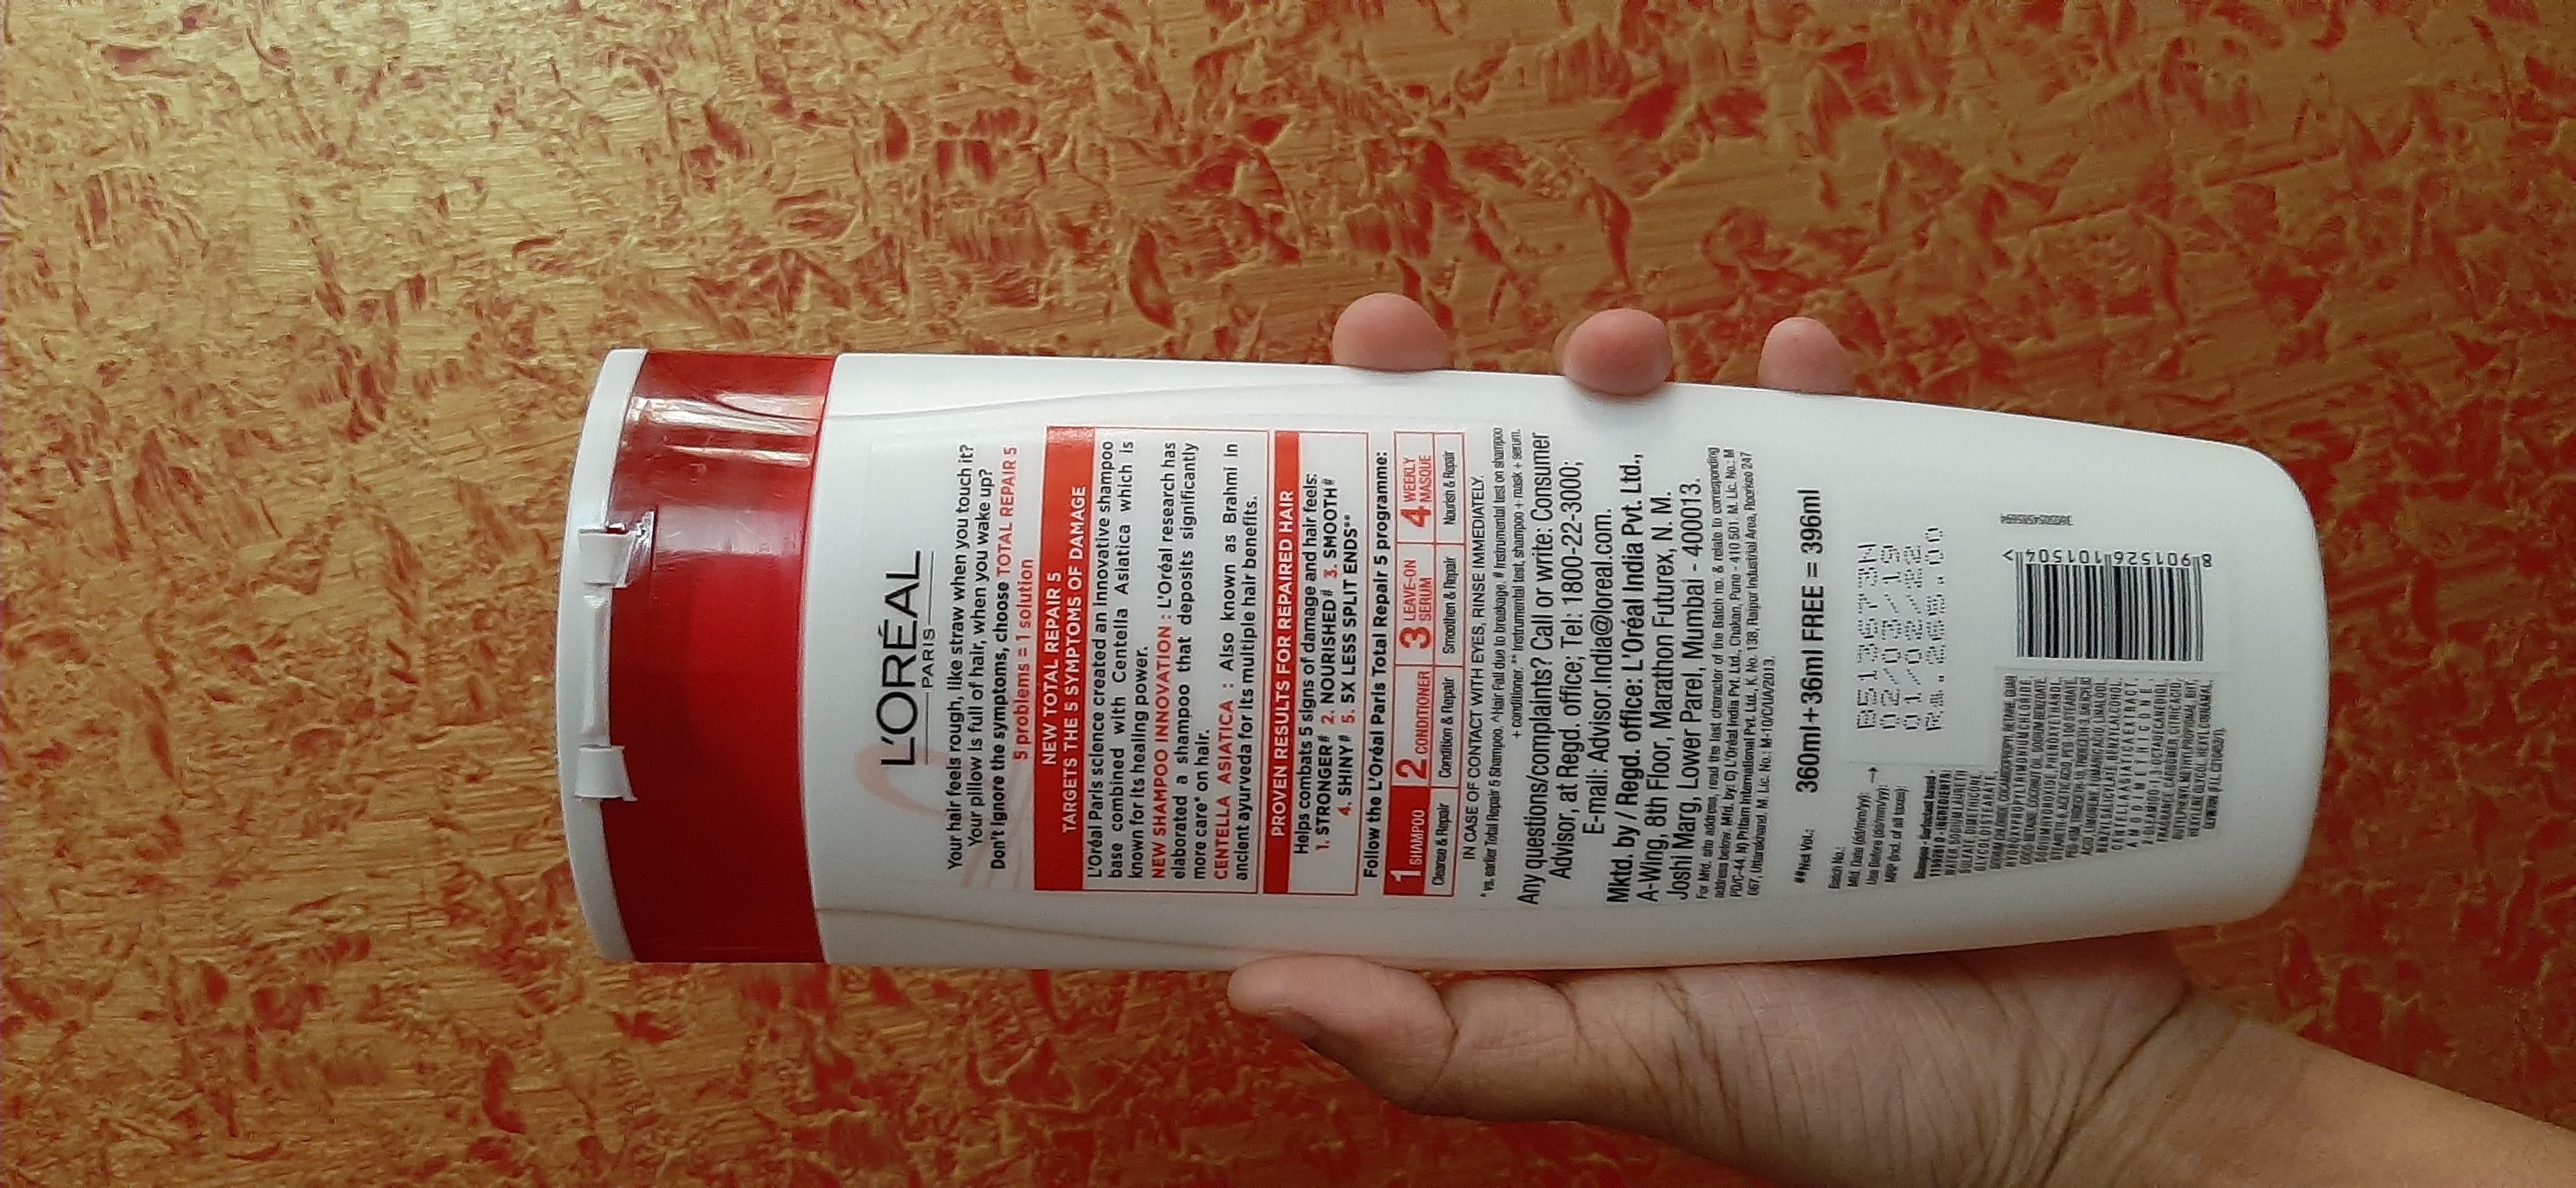 L'Oreal Paris Total Repair 5 Advanced Repairing Shampoo-Very drying-By samira_haider-2